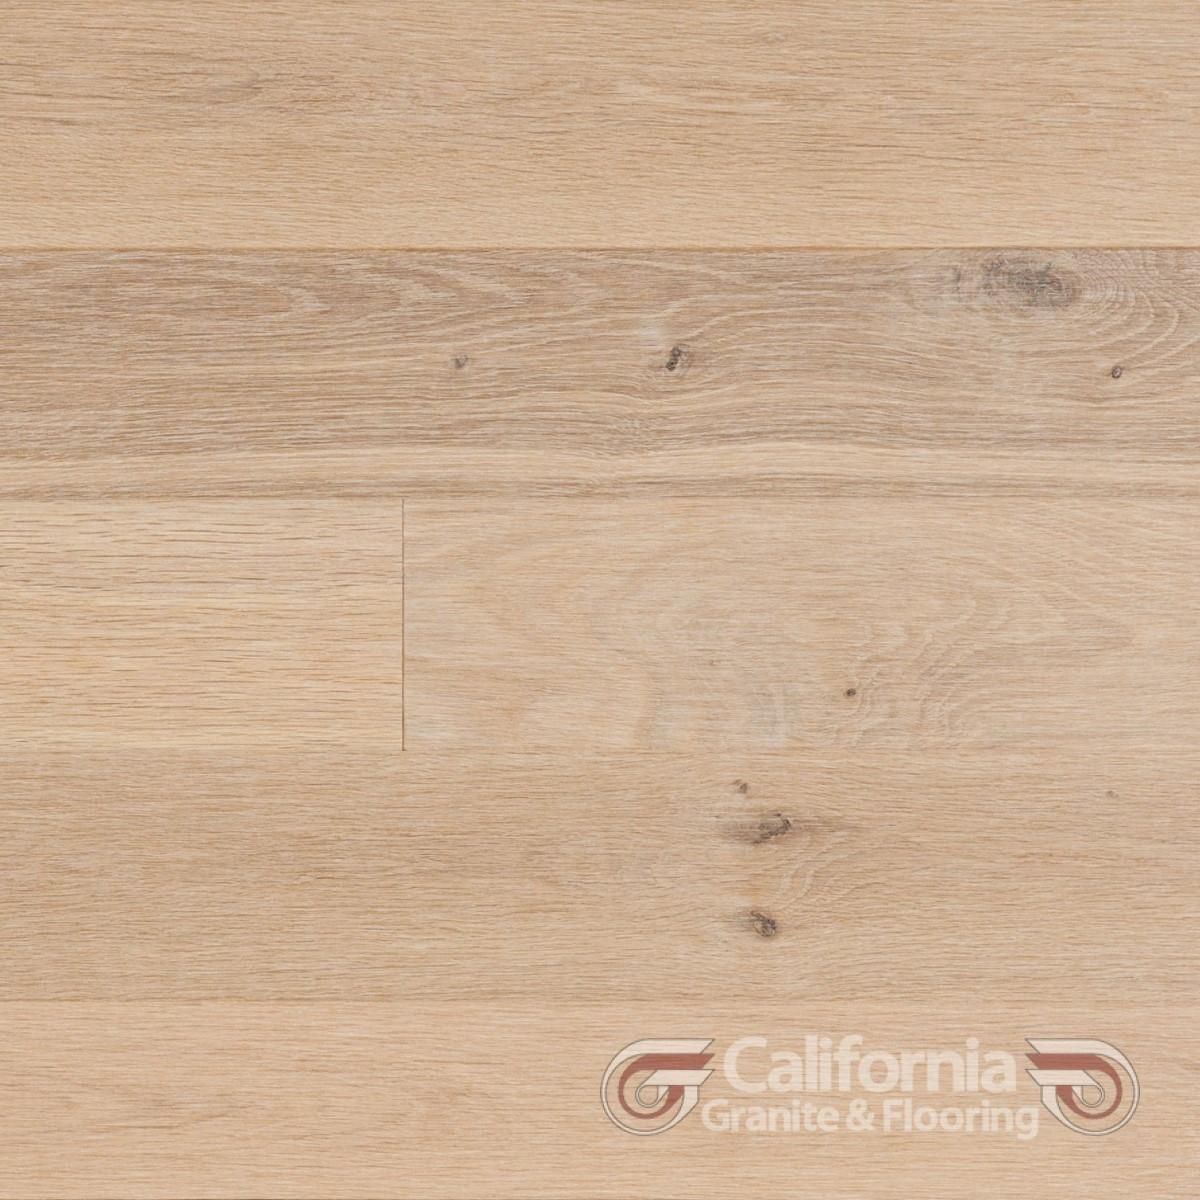 hardwood-flooring-white-oak-carousel-character-brushed-2